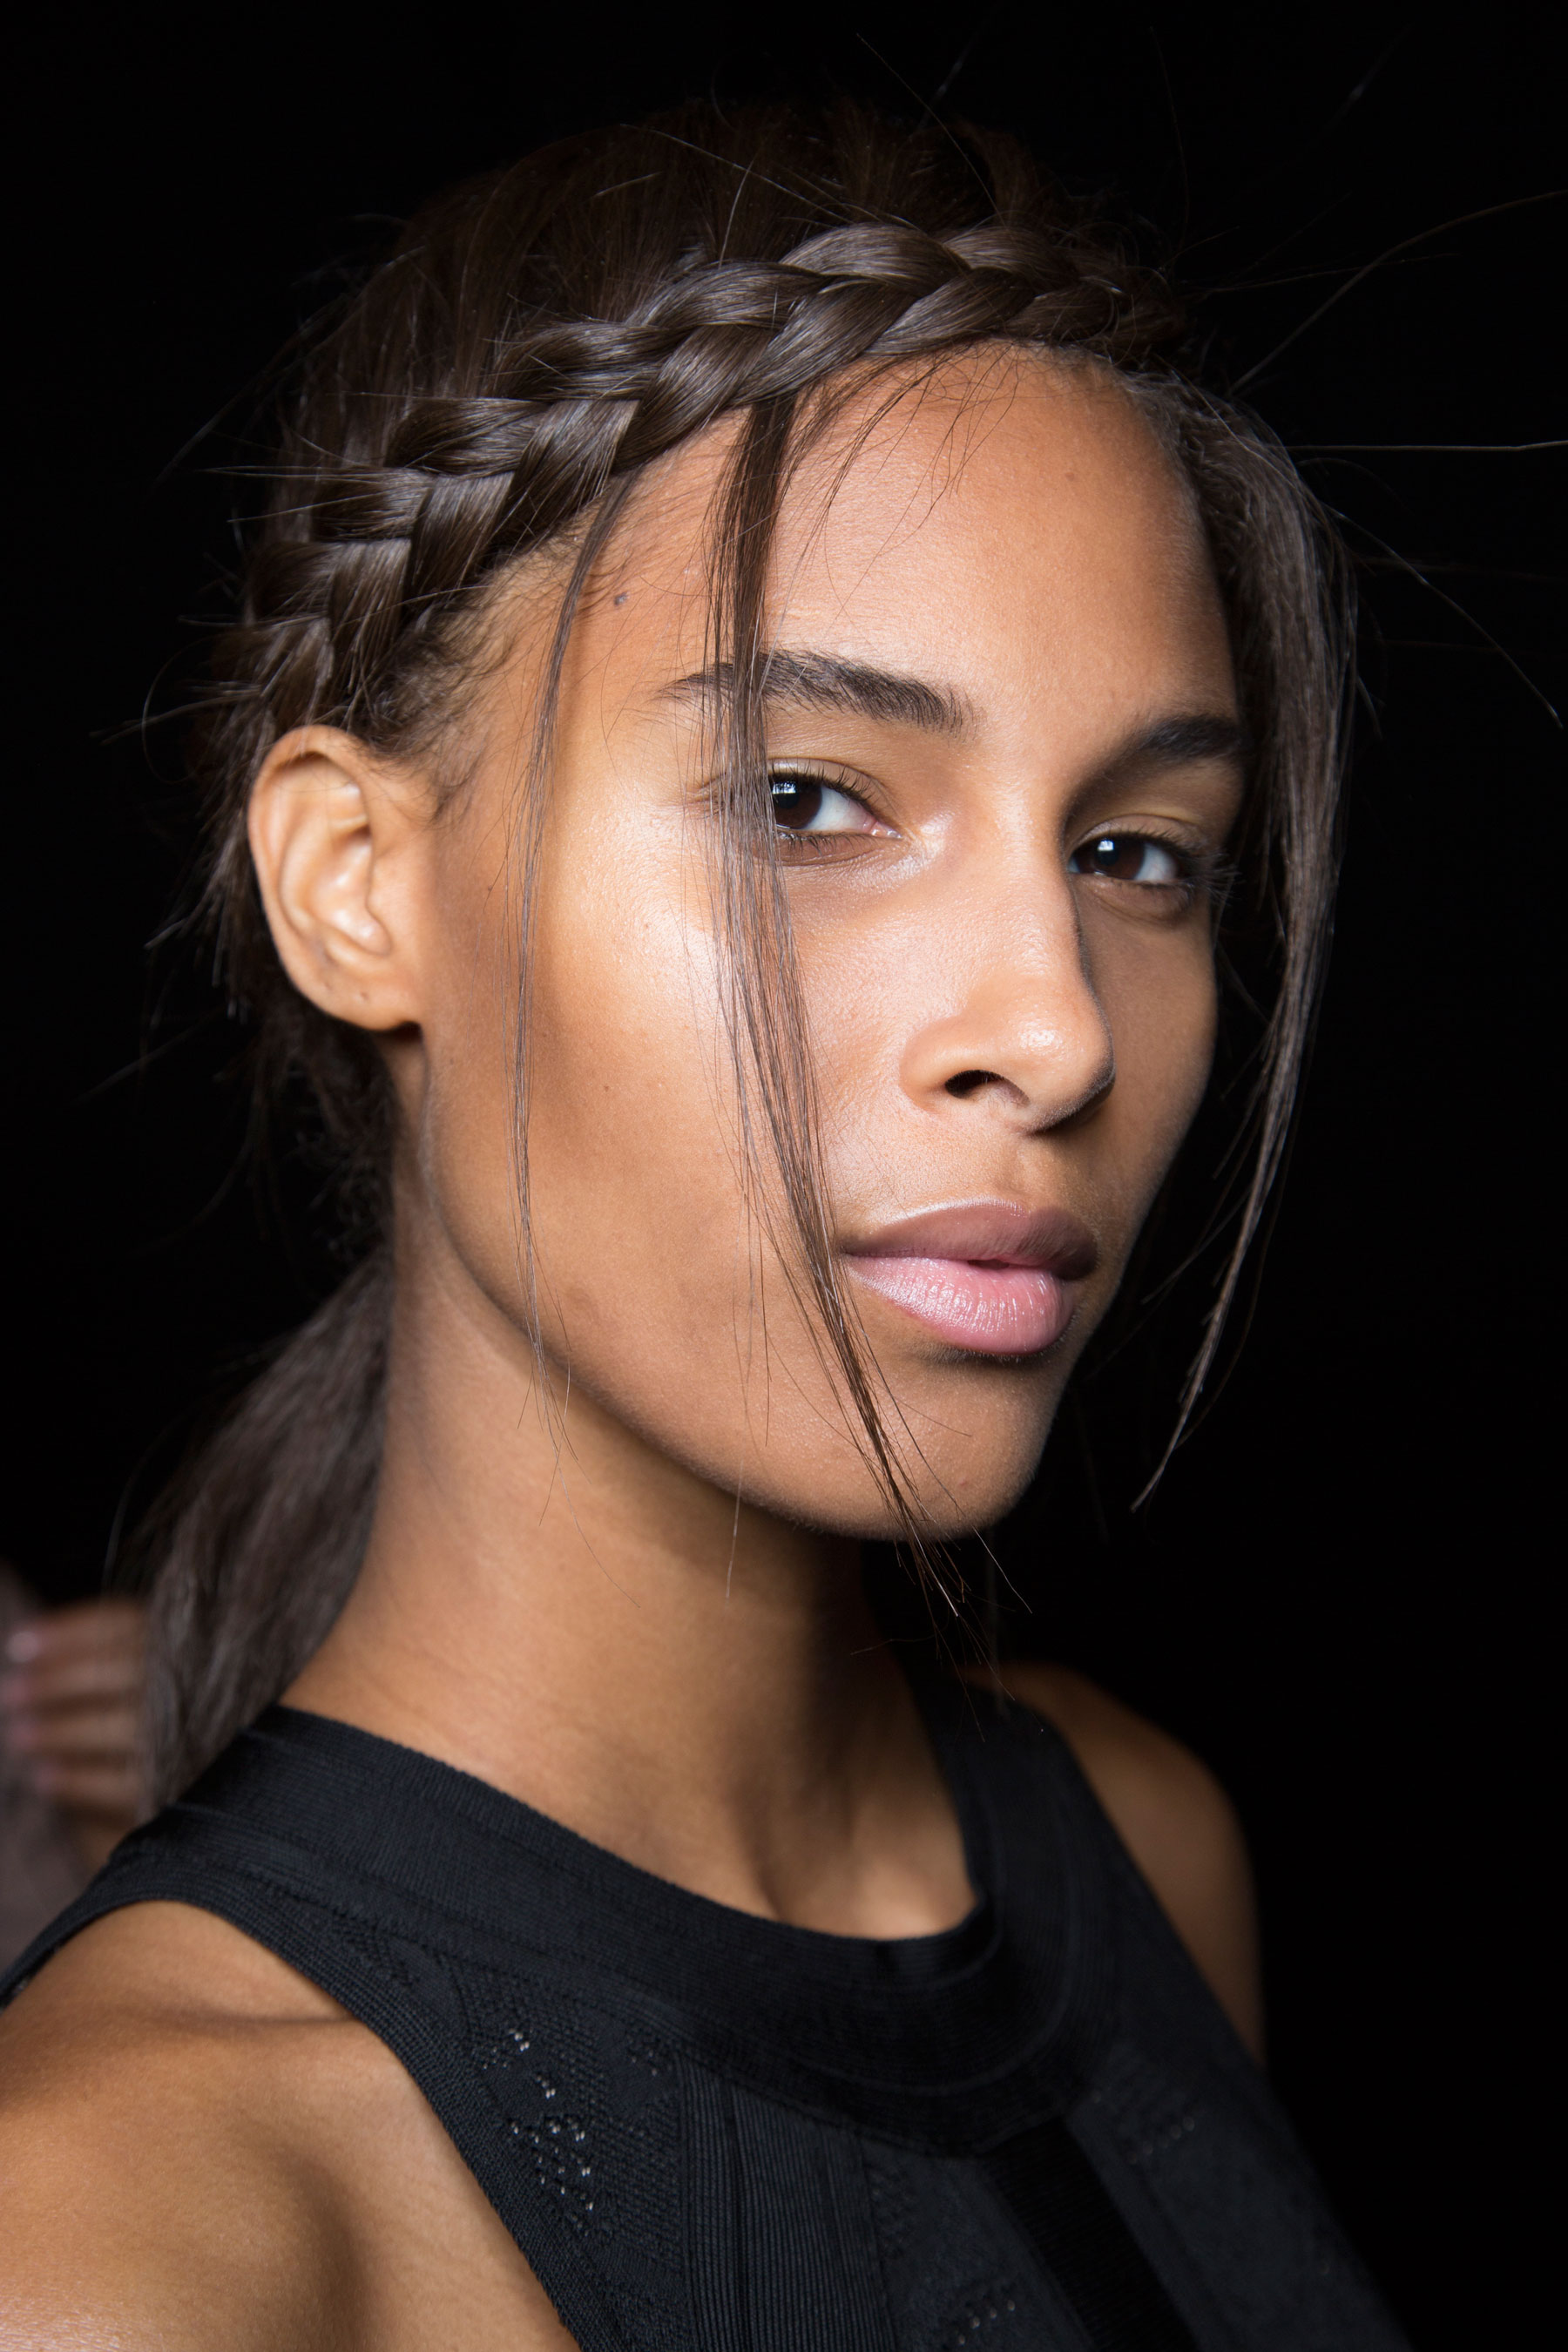 Herve-Leger-backstage-beauty-spring-2016-fashion-show-the-impression-82